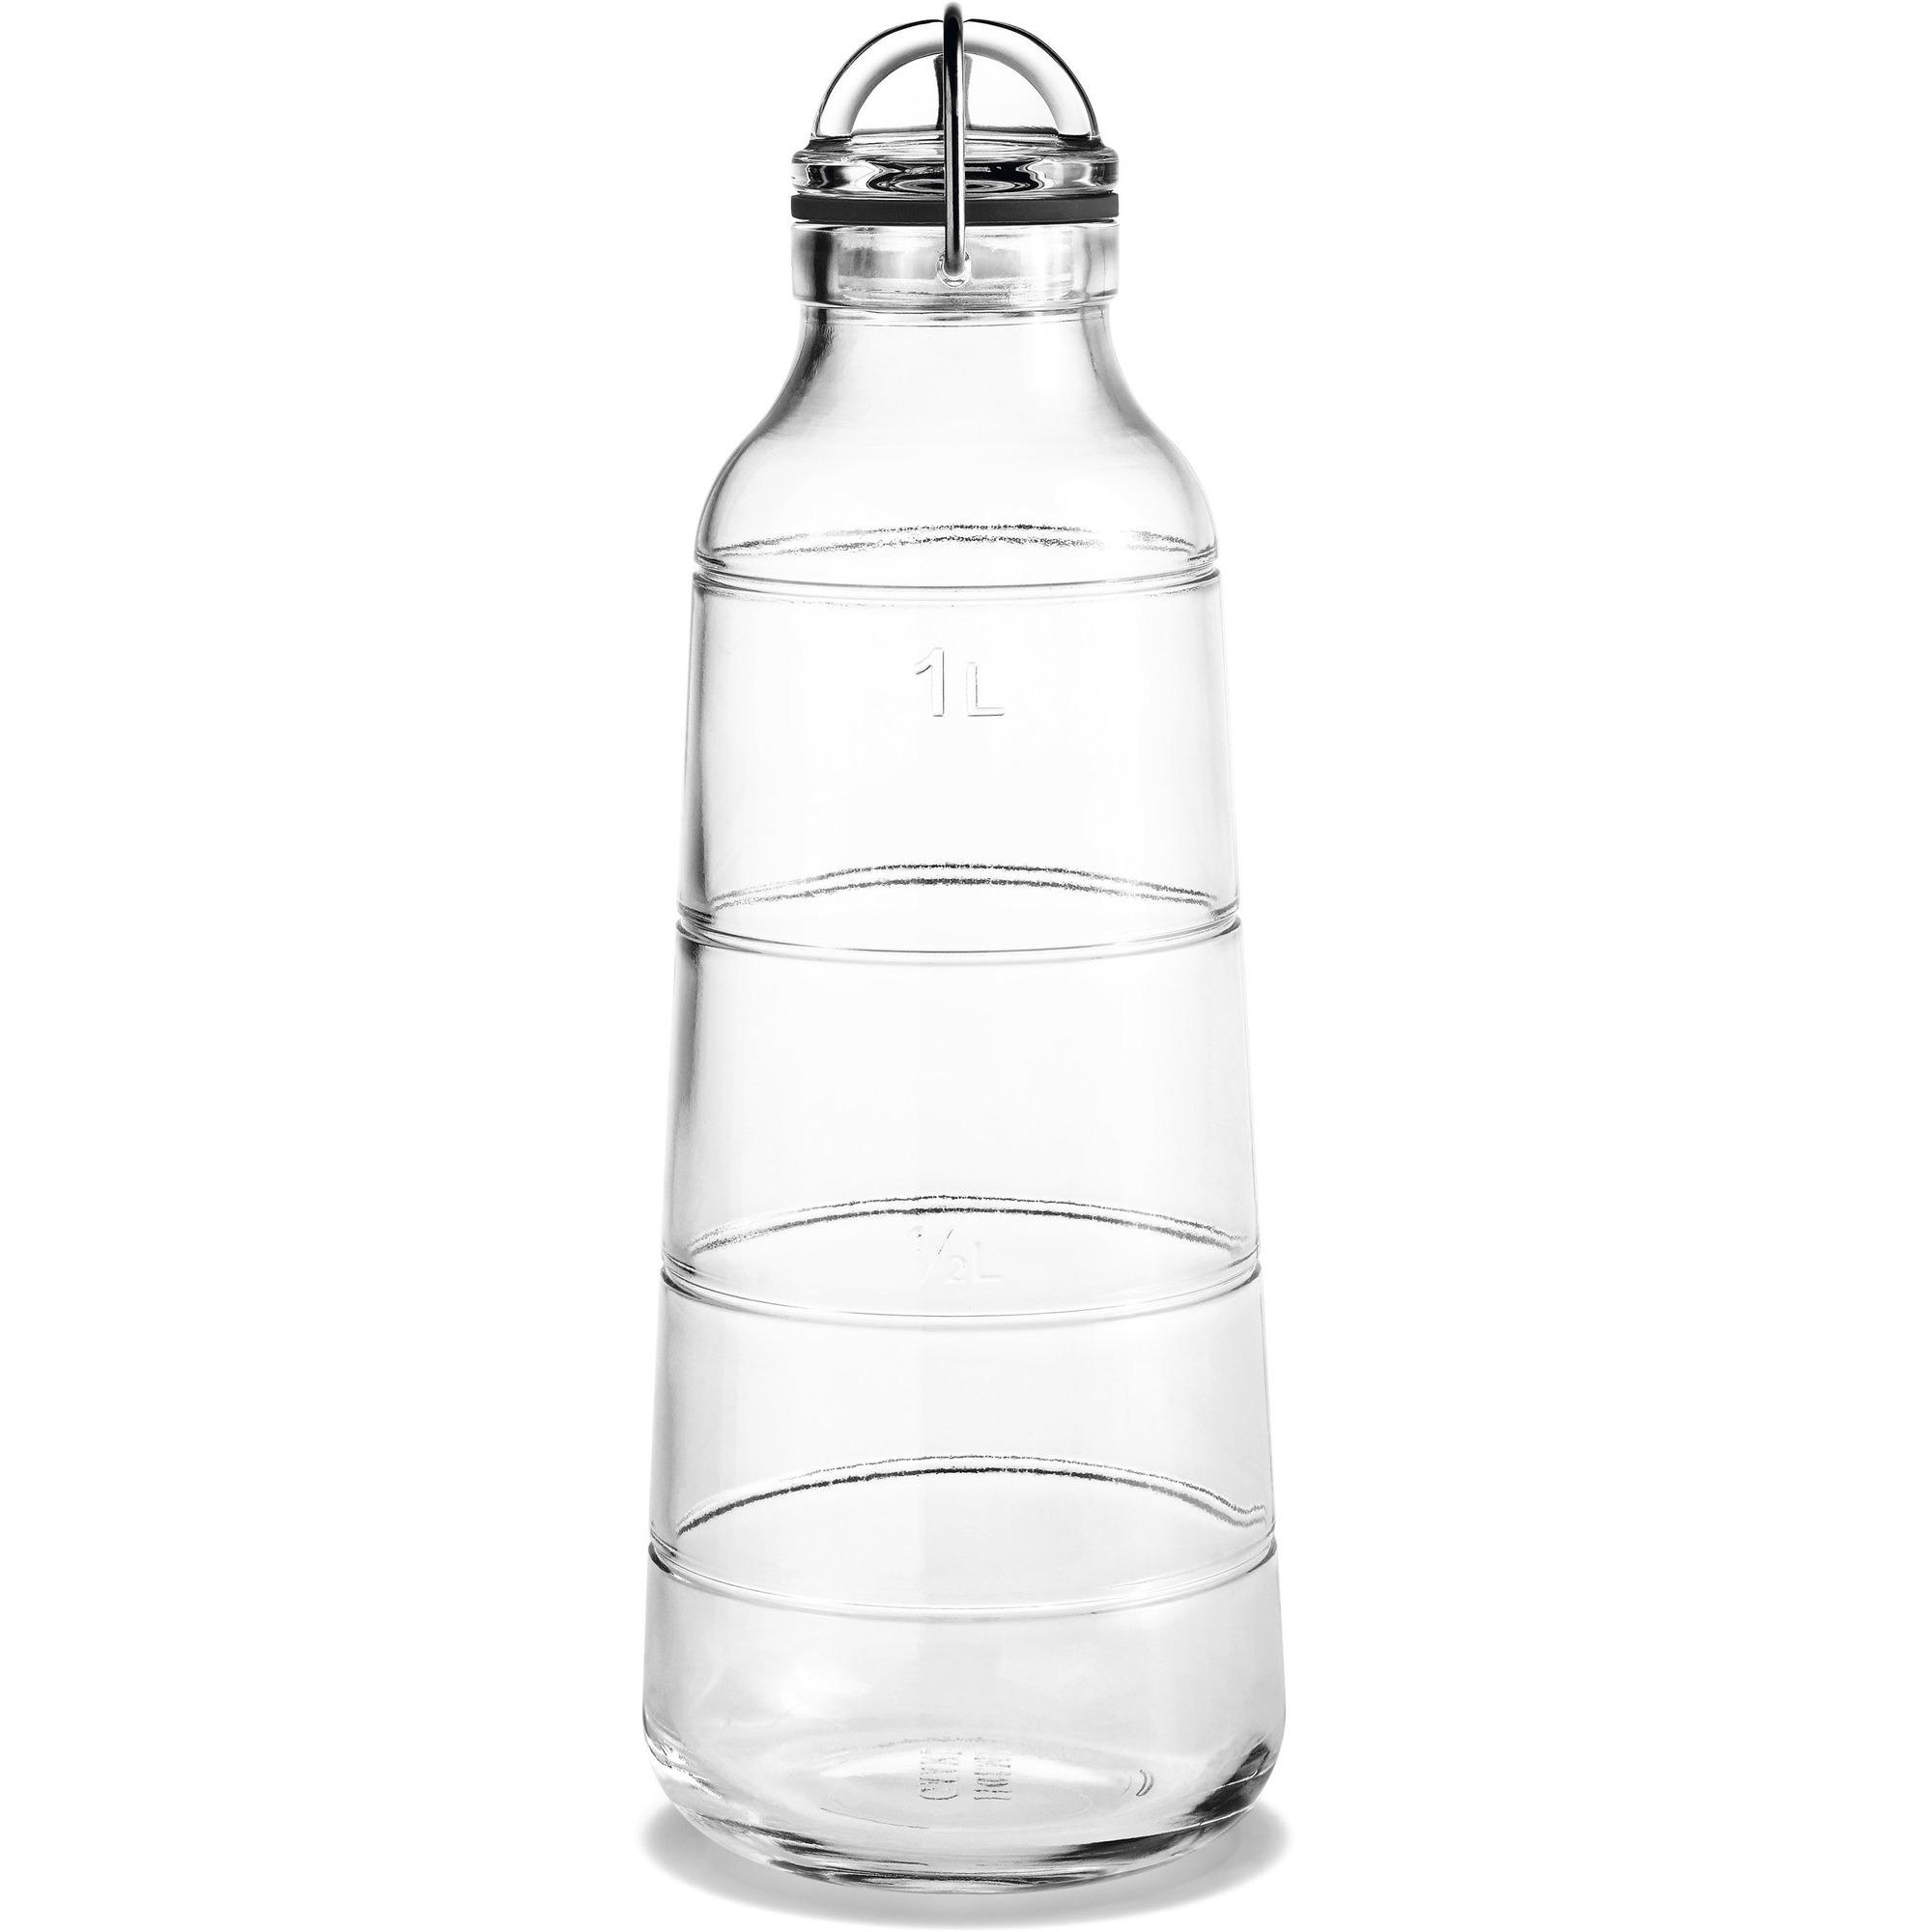 Holmegaard Scala Flaska 1 l